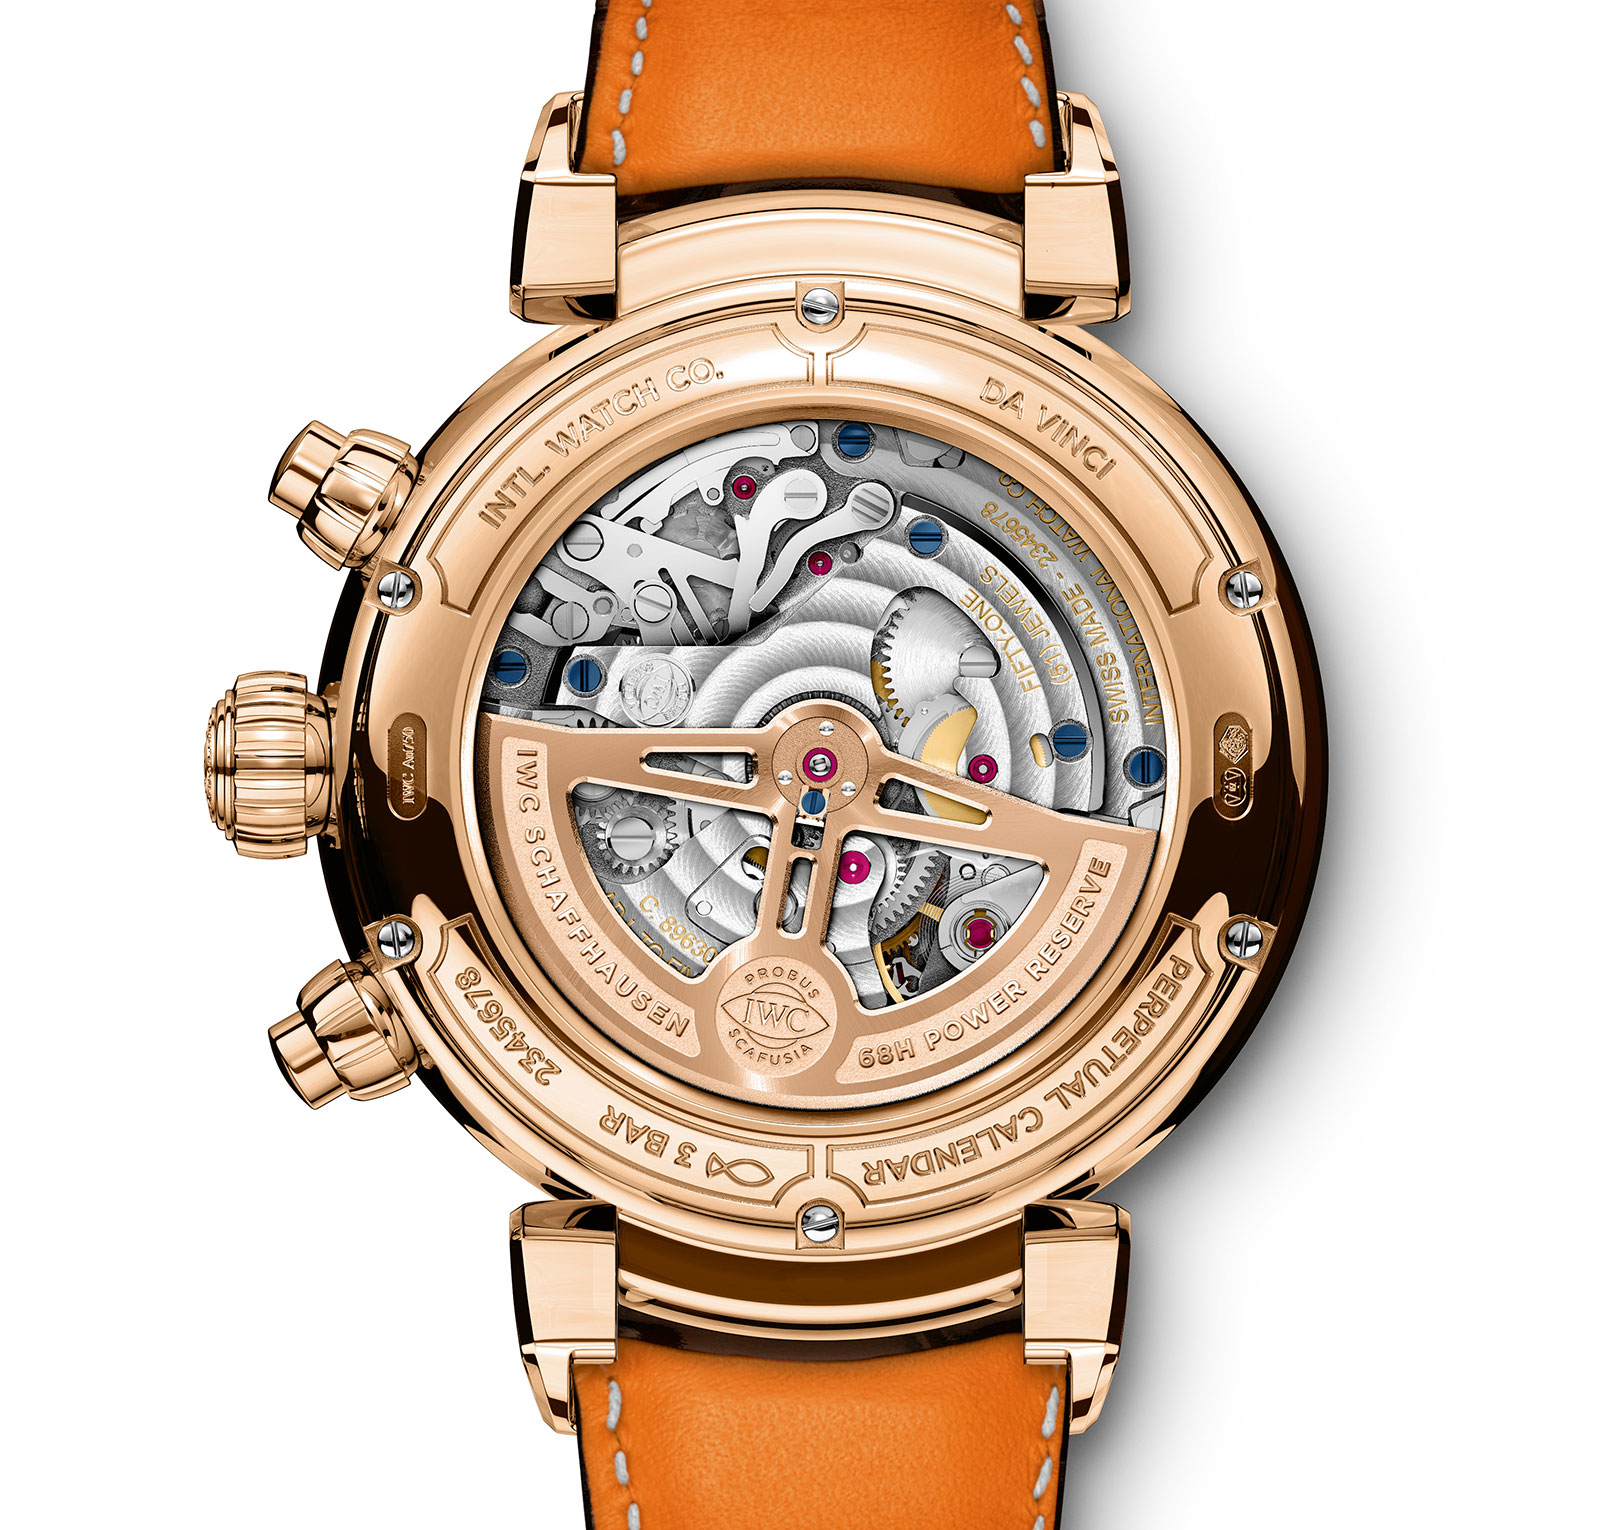 IWC Da Vinci Perpetual Calendar Chronograph back